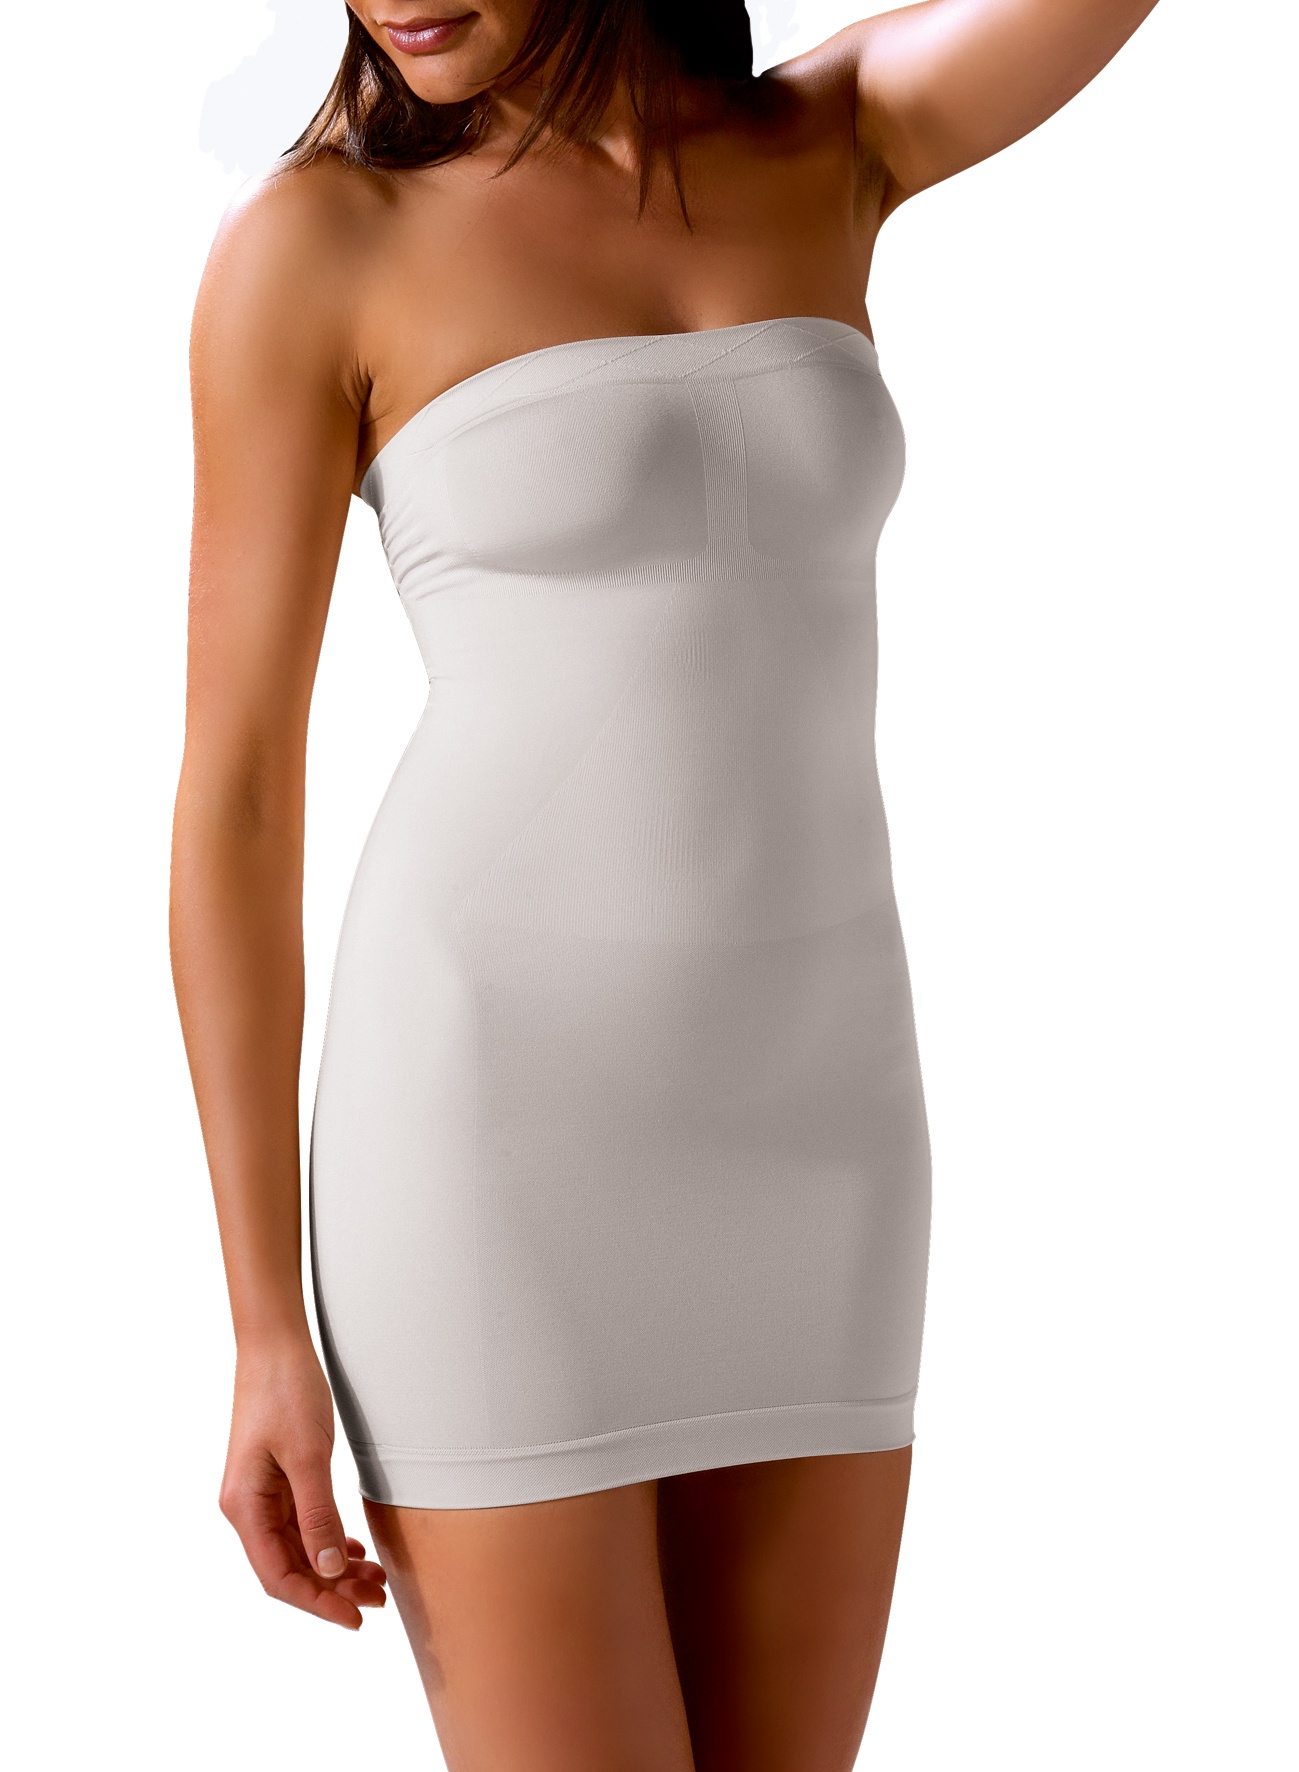 Корректирующее белье Control Body платье грация control body plus цвет бежевый 810135 skin размер l xl 50 52